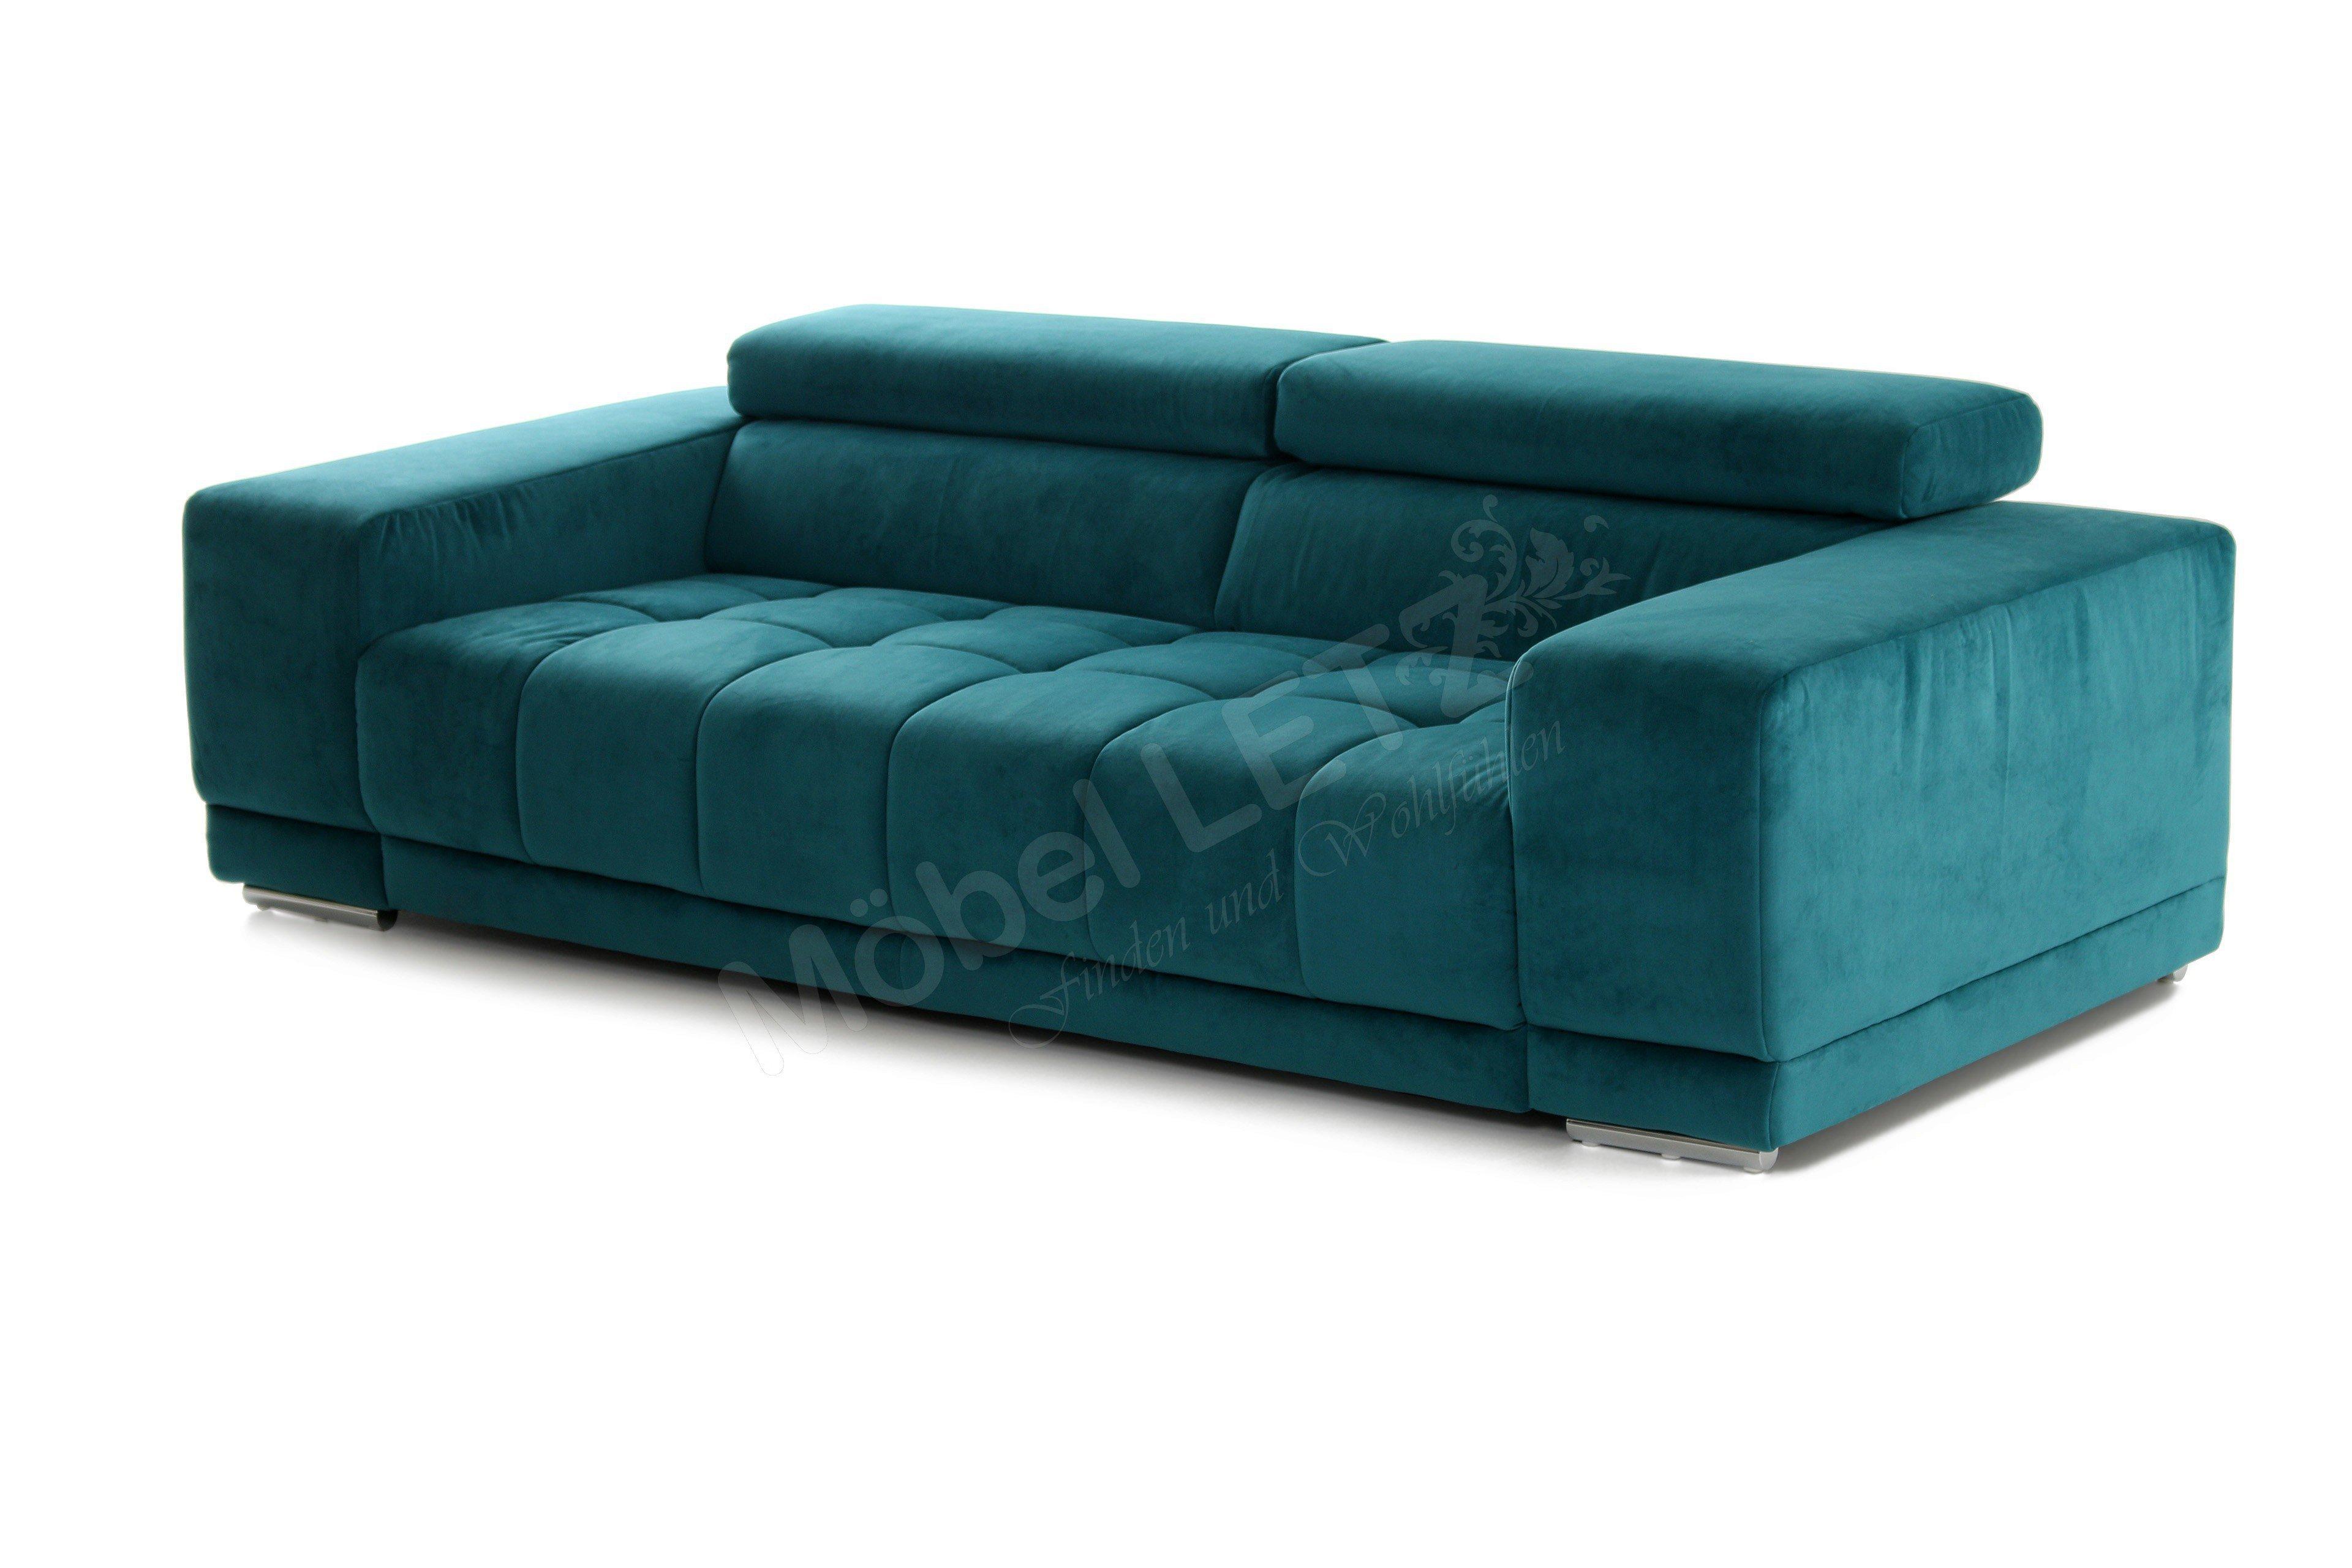 megapol satellite einzelsofa petrol m bel letz ihr online shop. Black Bedroom Furniture Sets. Home Design Ideas